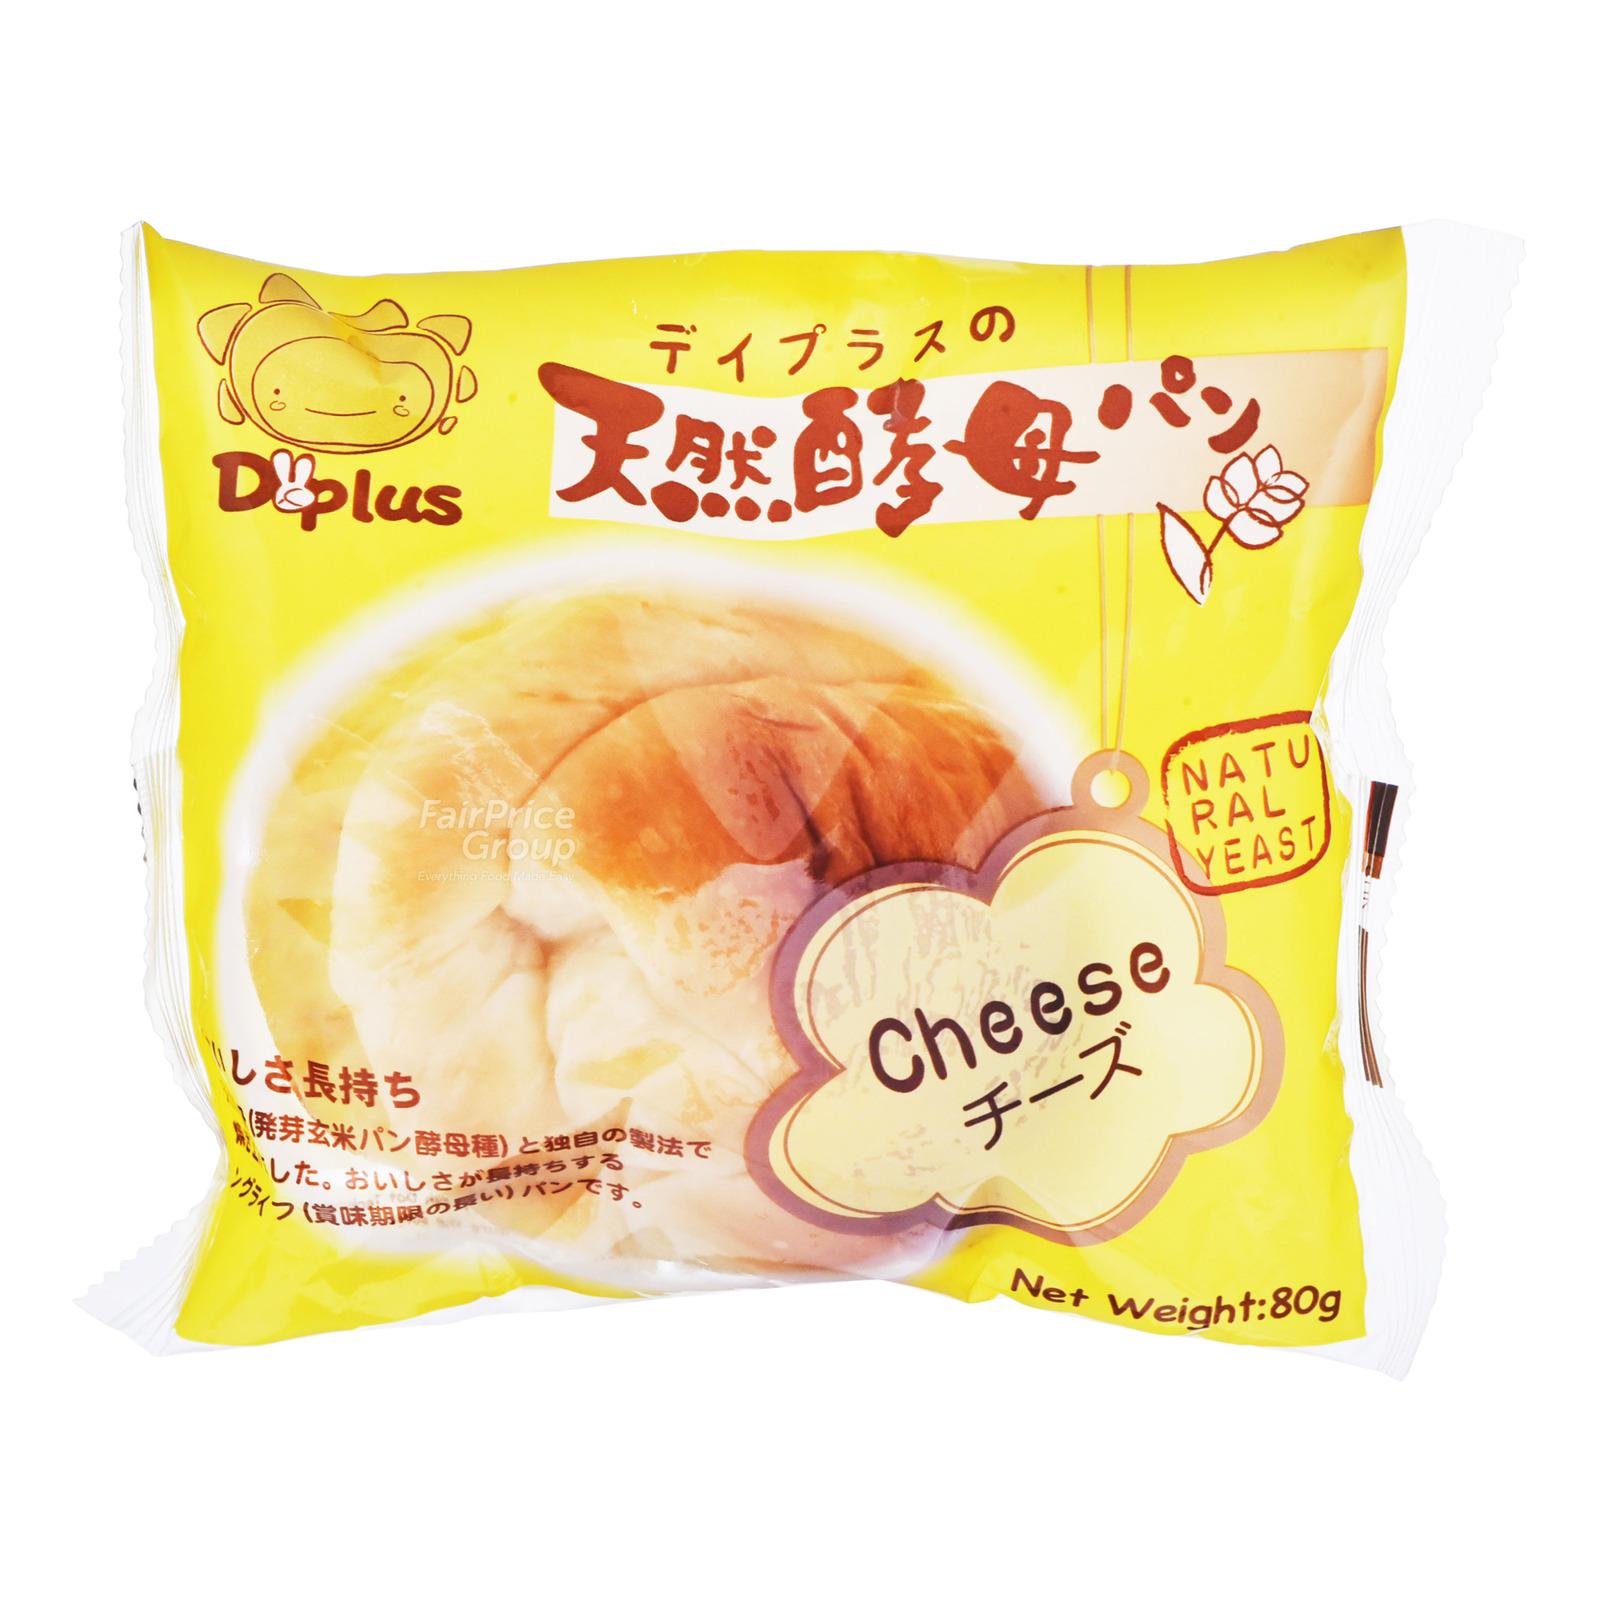 Dayplus Natural Yeast Bread - Cheese